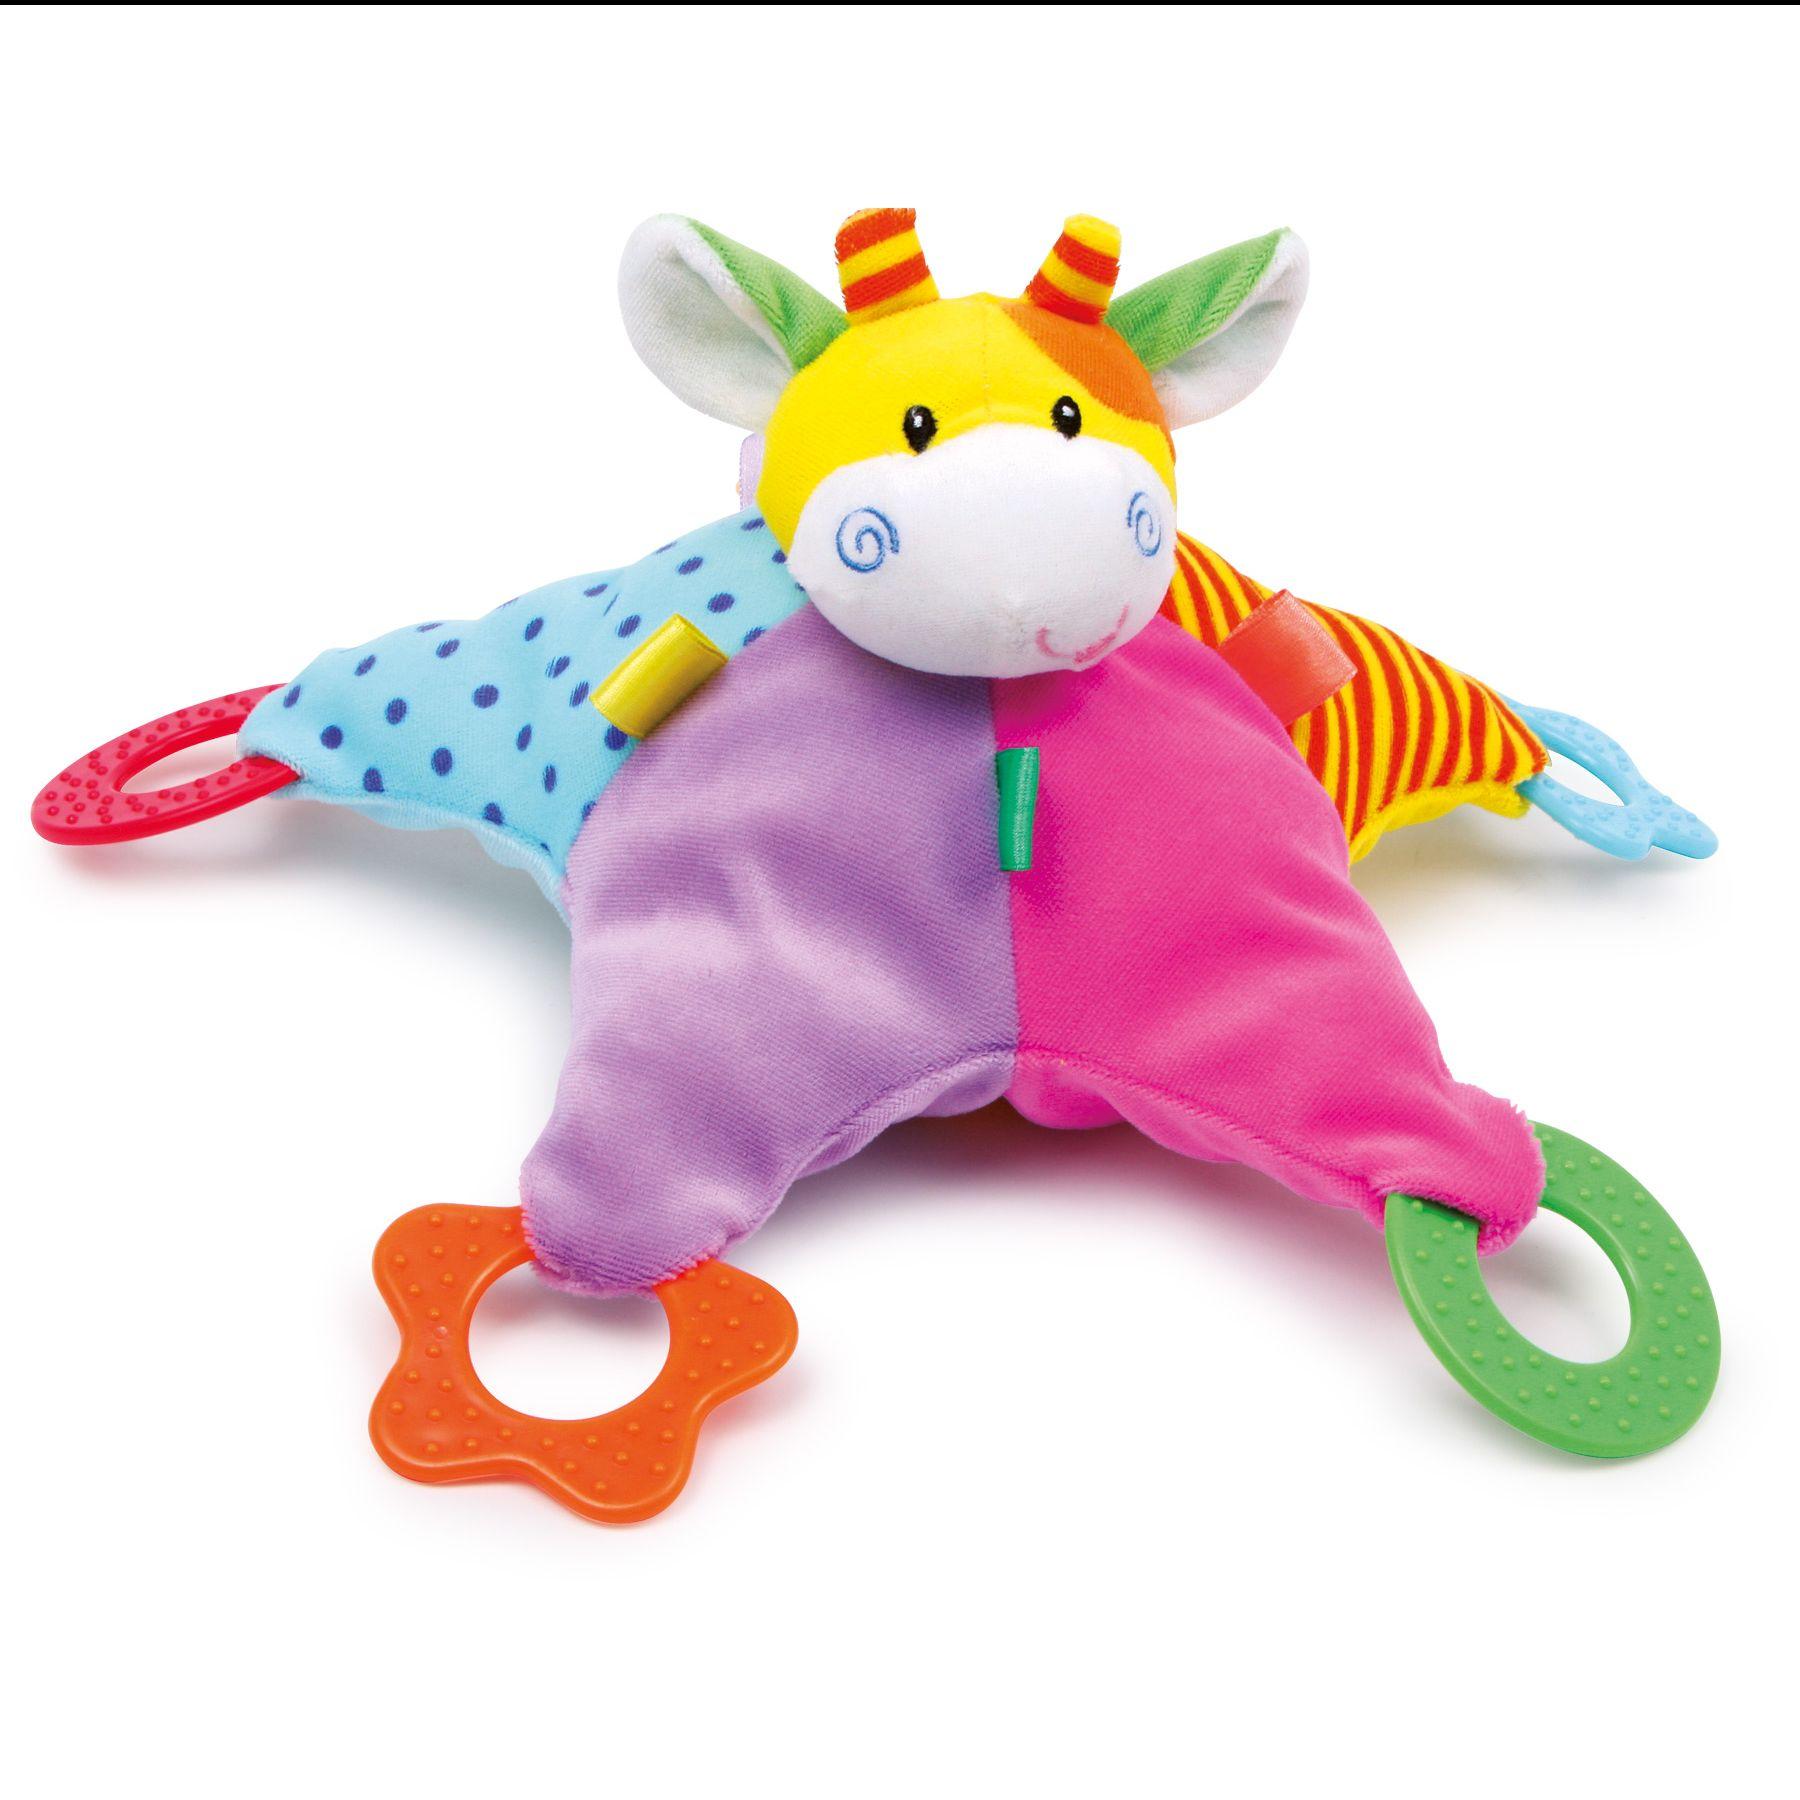 Doudous Legler - Small foot Baby Doudou Hochet étoile girafe avec anneaux de dentition